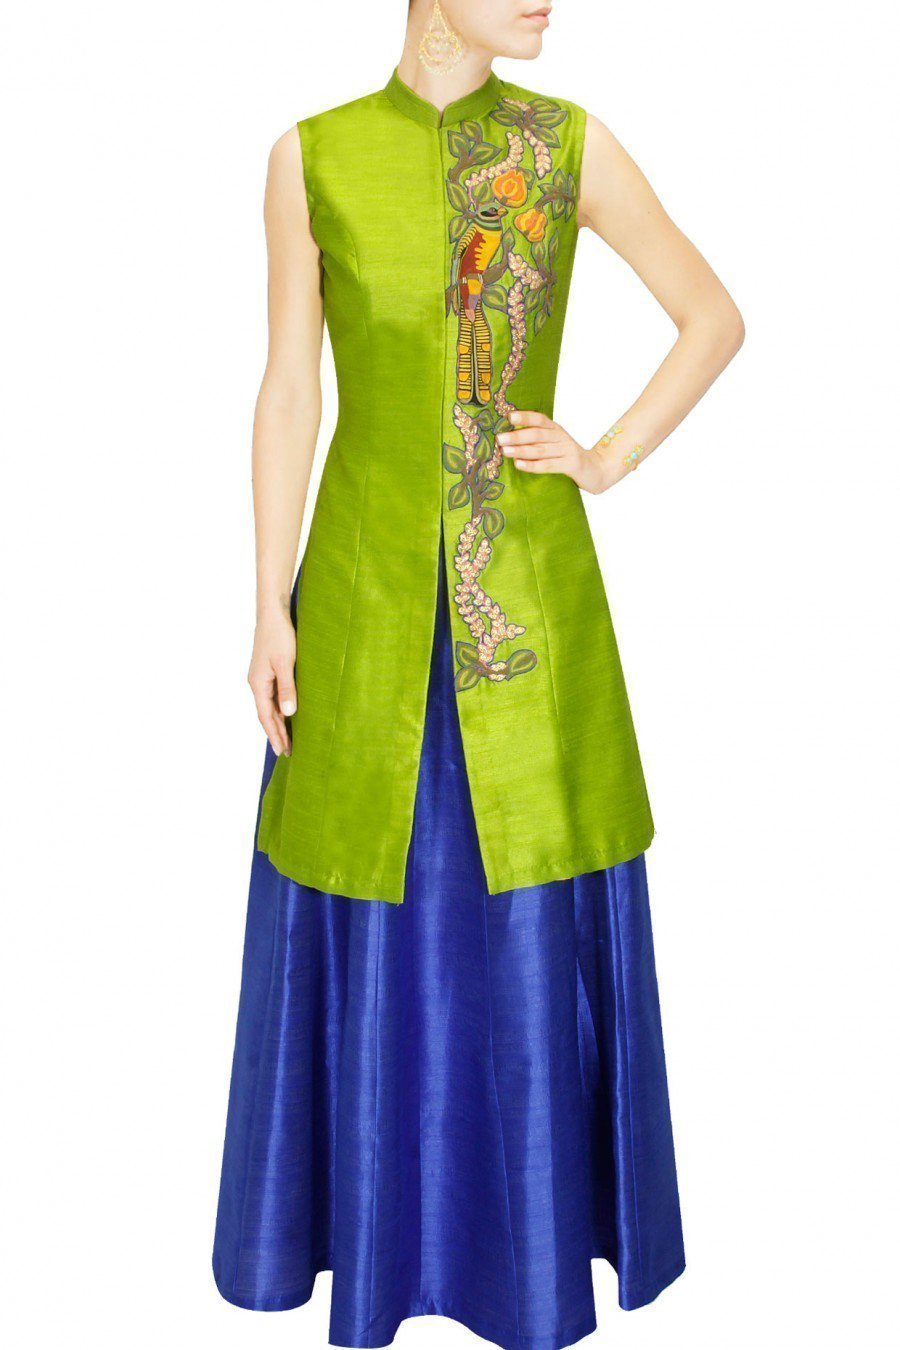 Lime Green Jacket with Cobalt Blue Plain Skirt